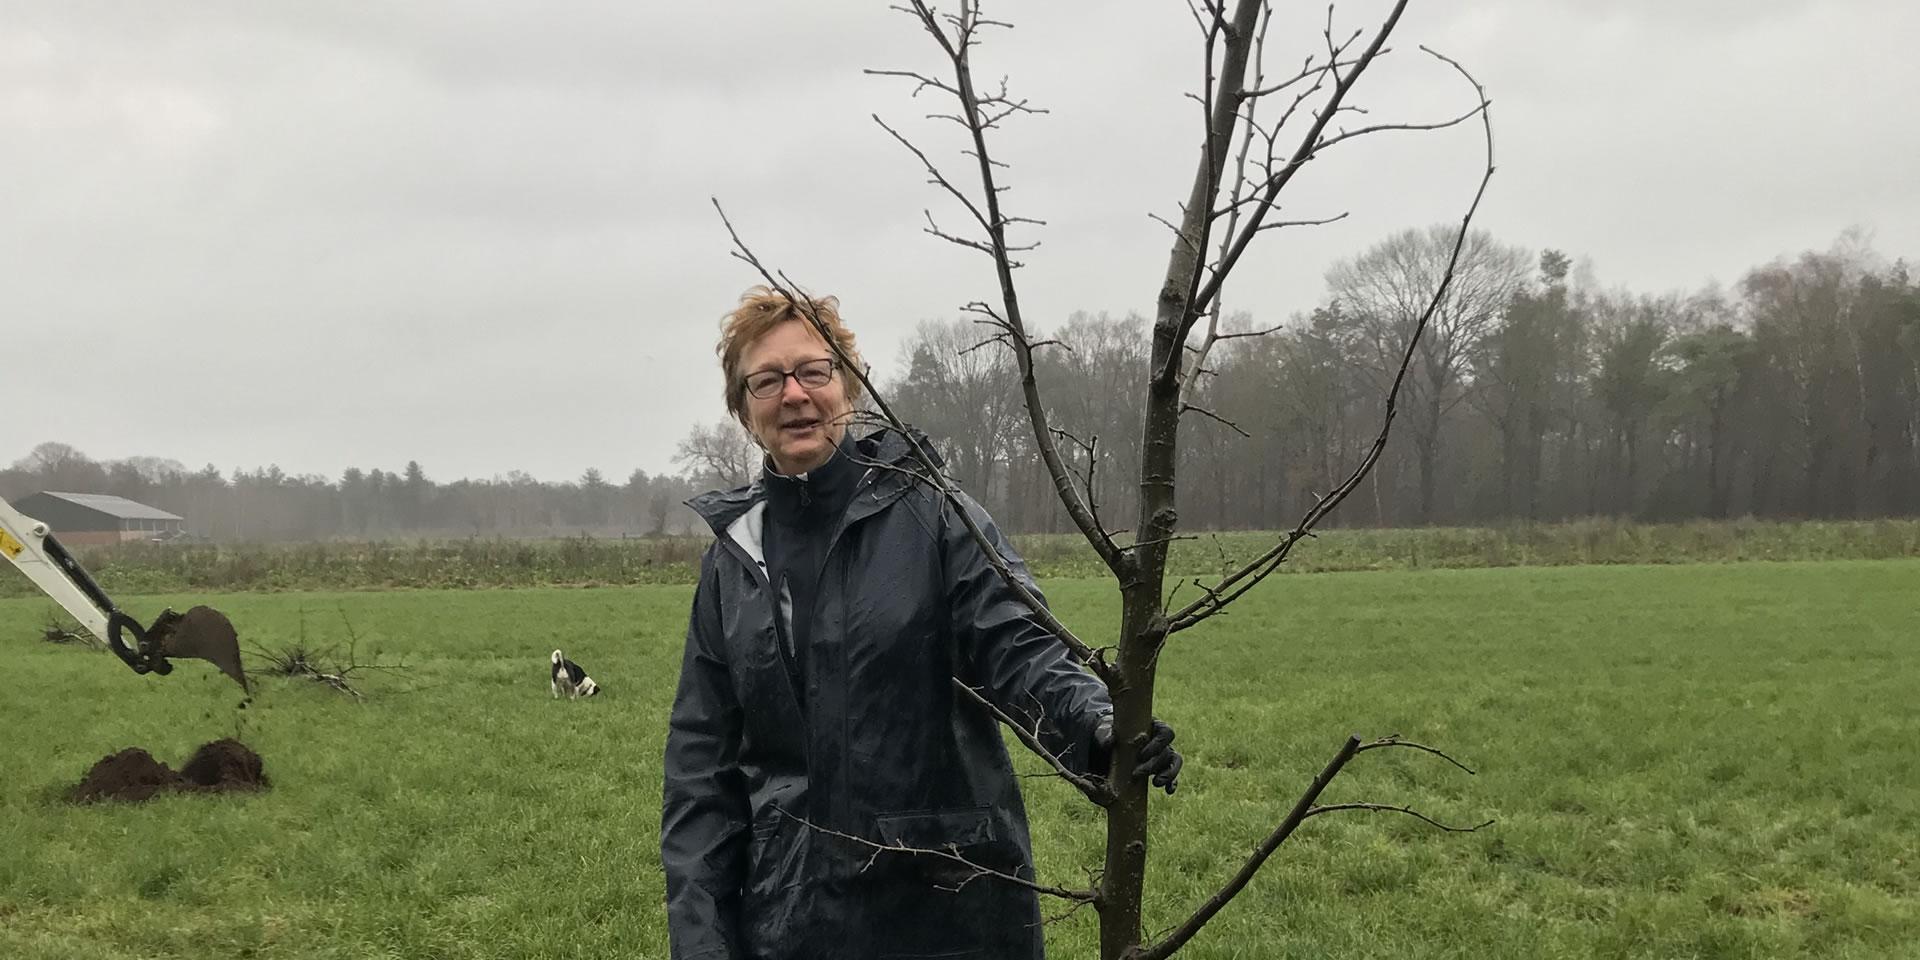 EBK - Mieke van den Bergh